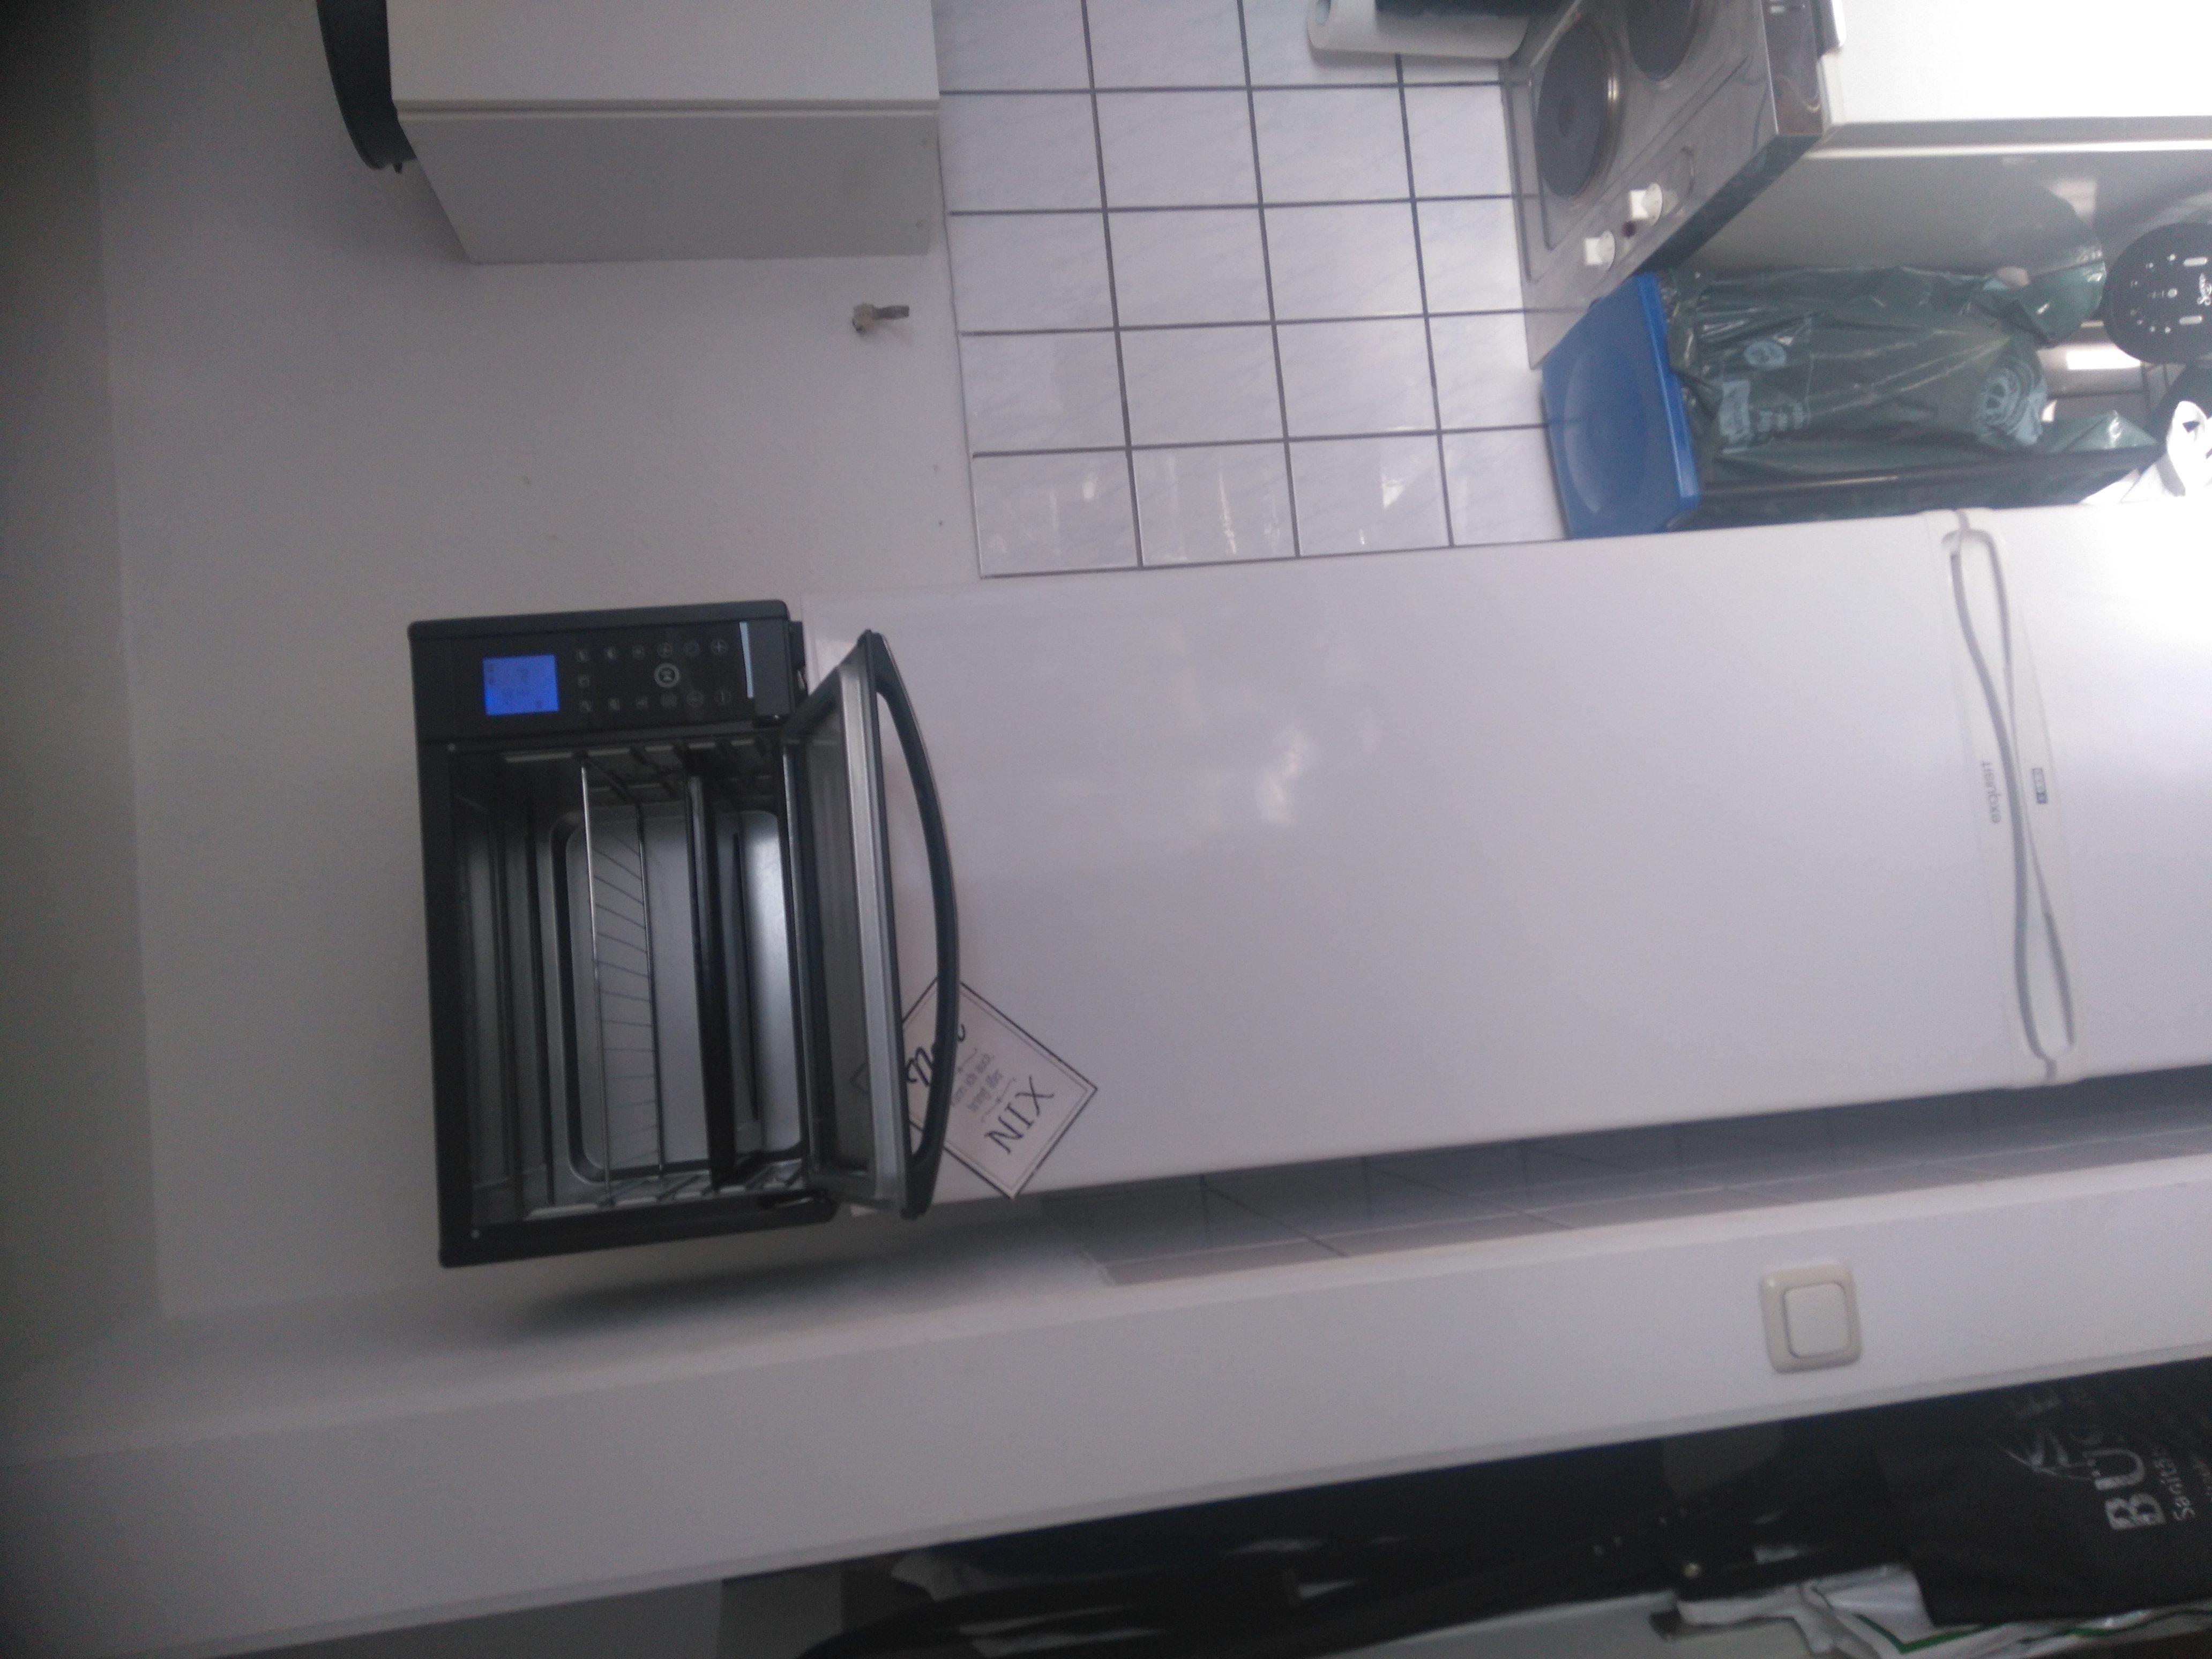 Bosch Kühlschrank Heiß : Kühlschrank kompressor wie heiß kühlschrank kompressor wie heiß